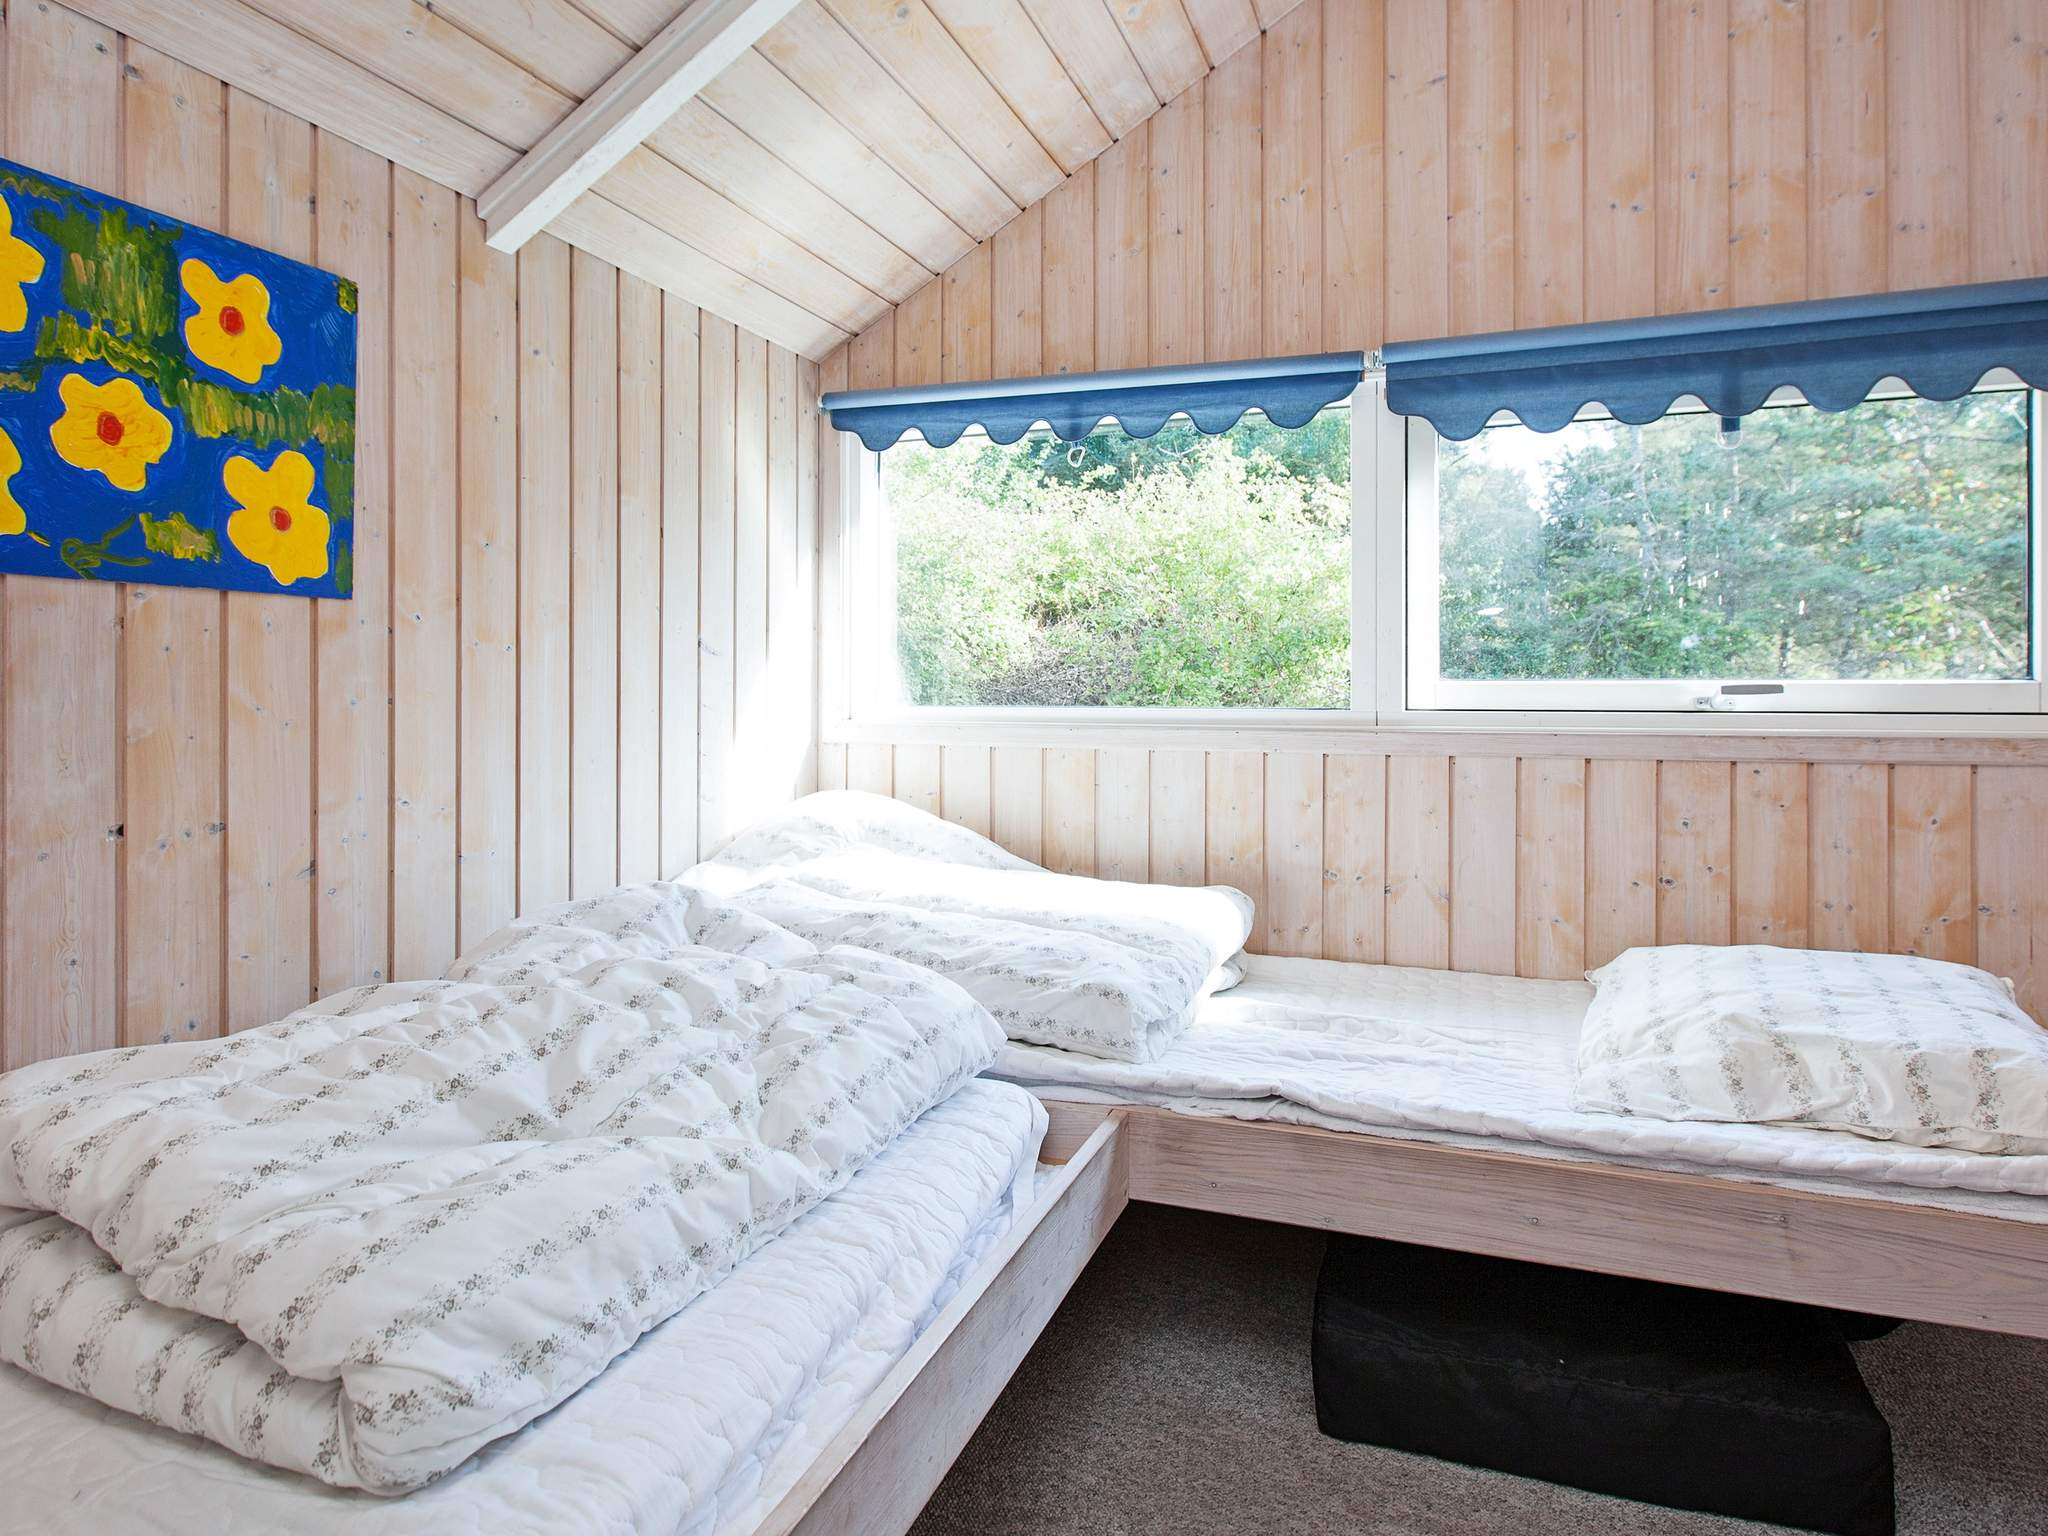 Ferienhaus Holløselund Strand (87423), Holløse, , Nordseeland, Dänemark, Bild 13